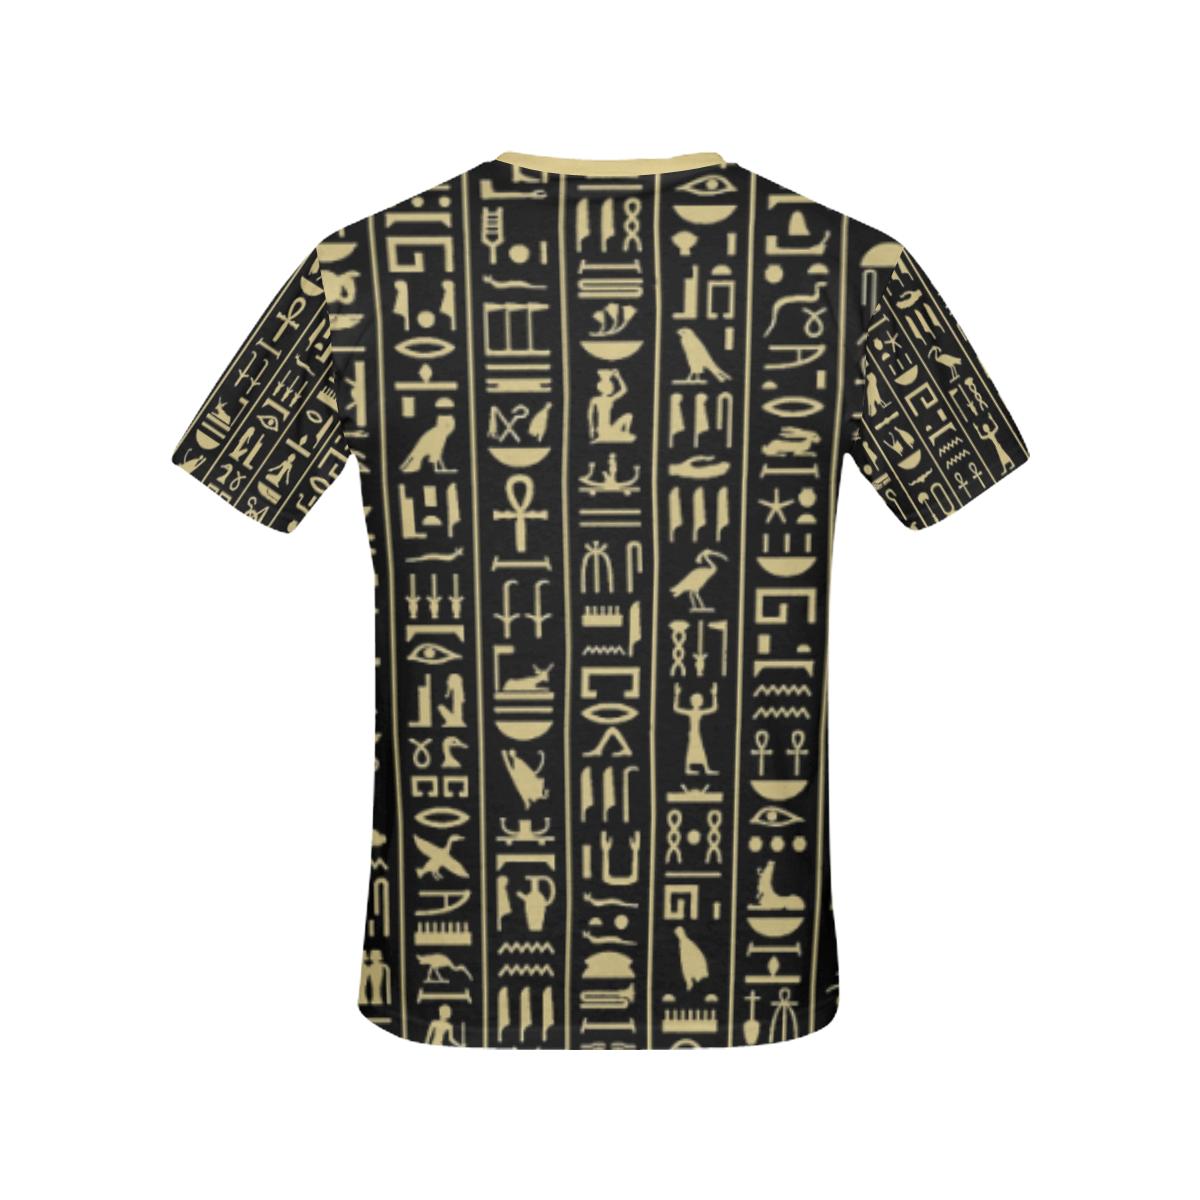 hieroglyphs alphabet All Over Print T-shirt for Women/Large Size (USA Size) (Model T40)